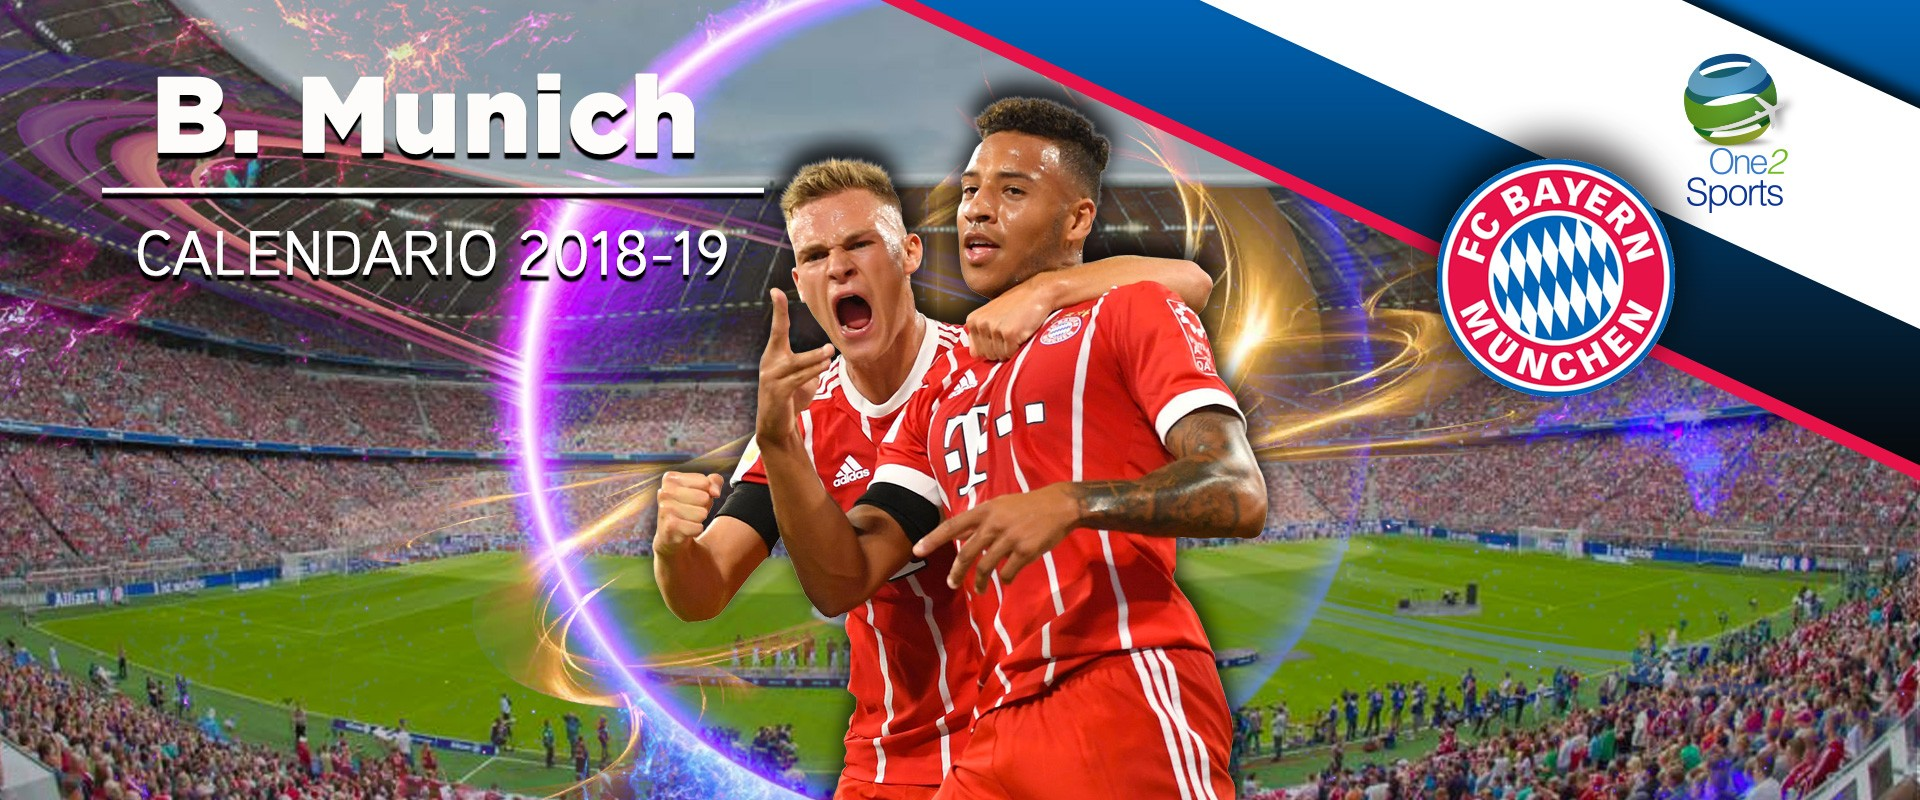 Calendario Bayern.Calendario Bayern Munich One2 Travel Group